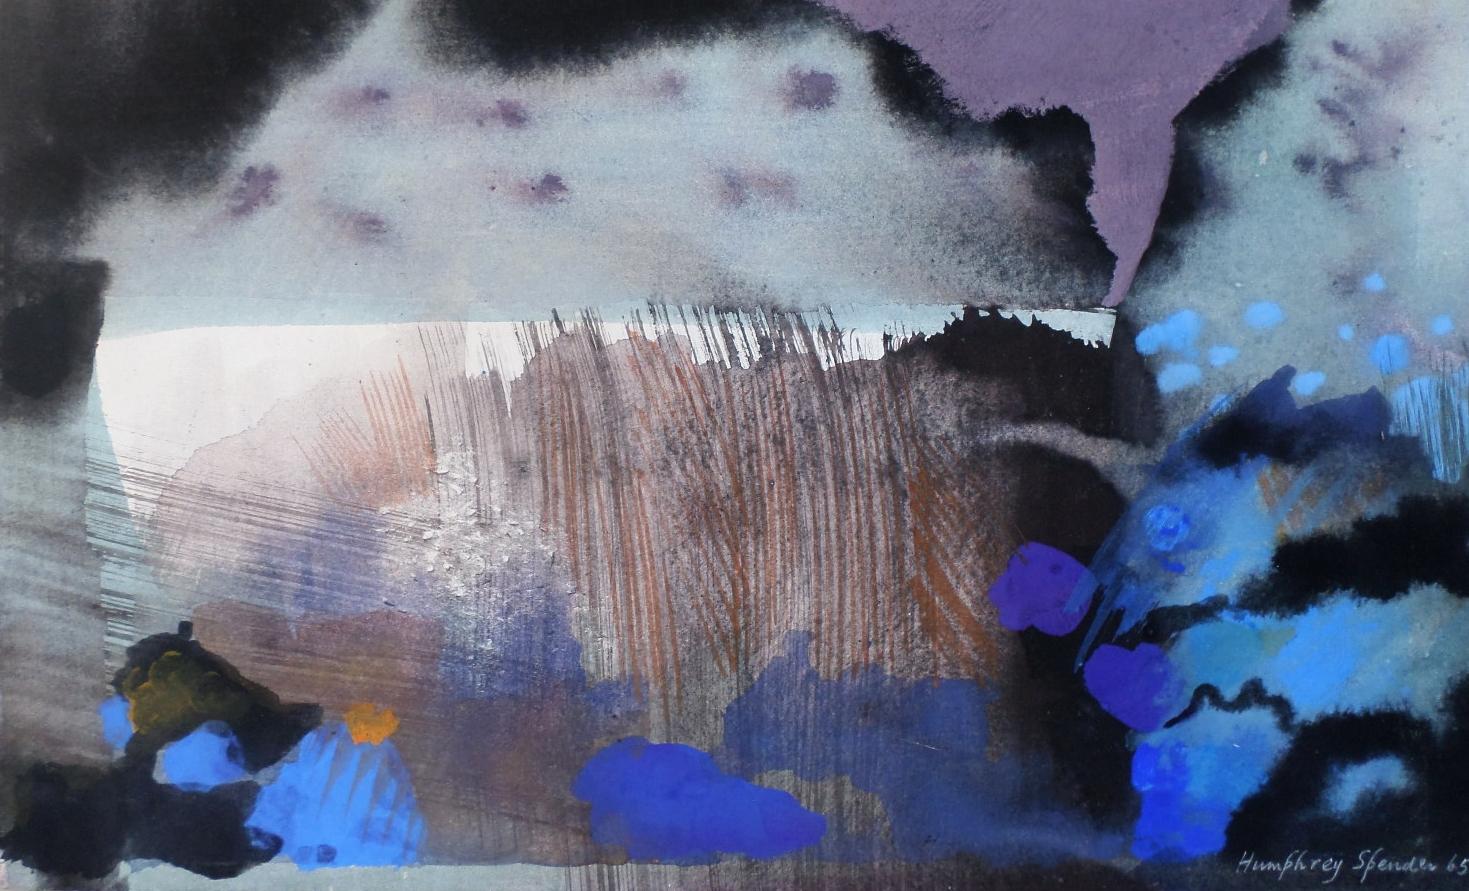 Humphrey Spender artist for sale